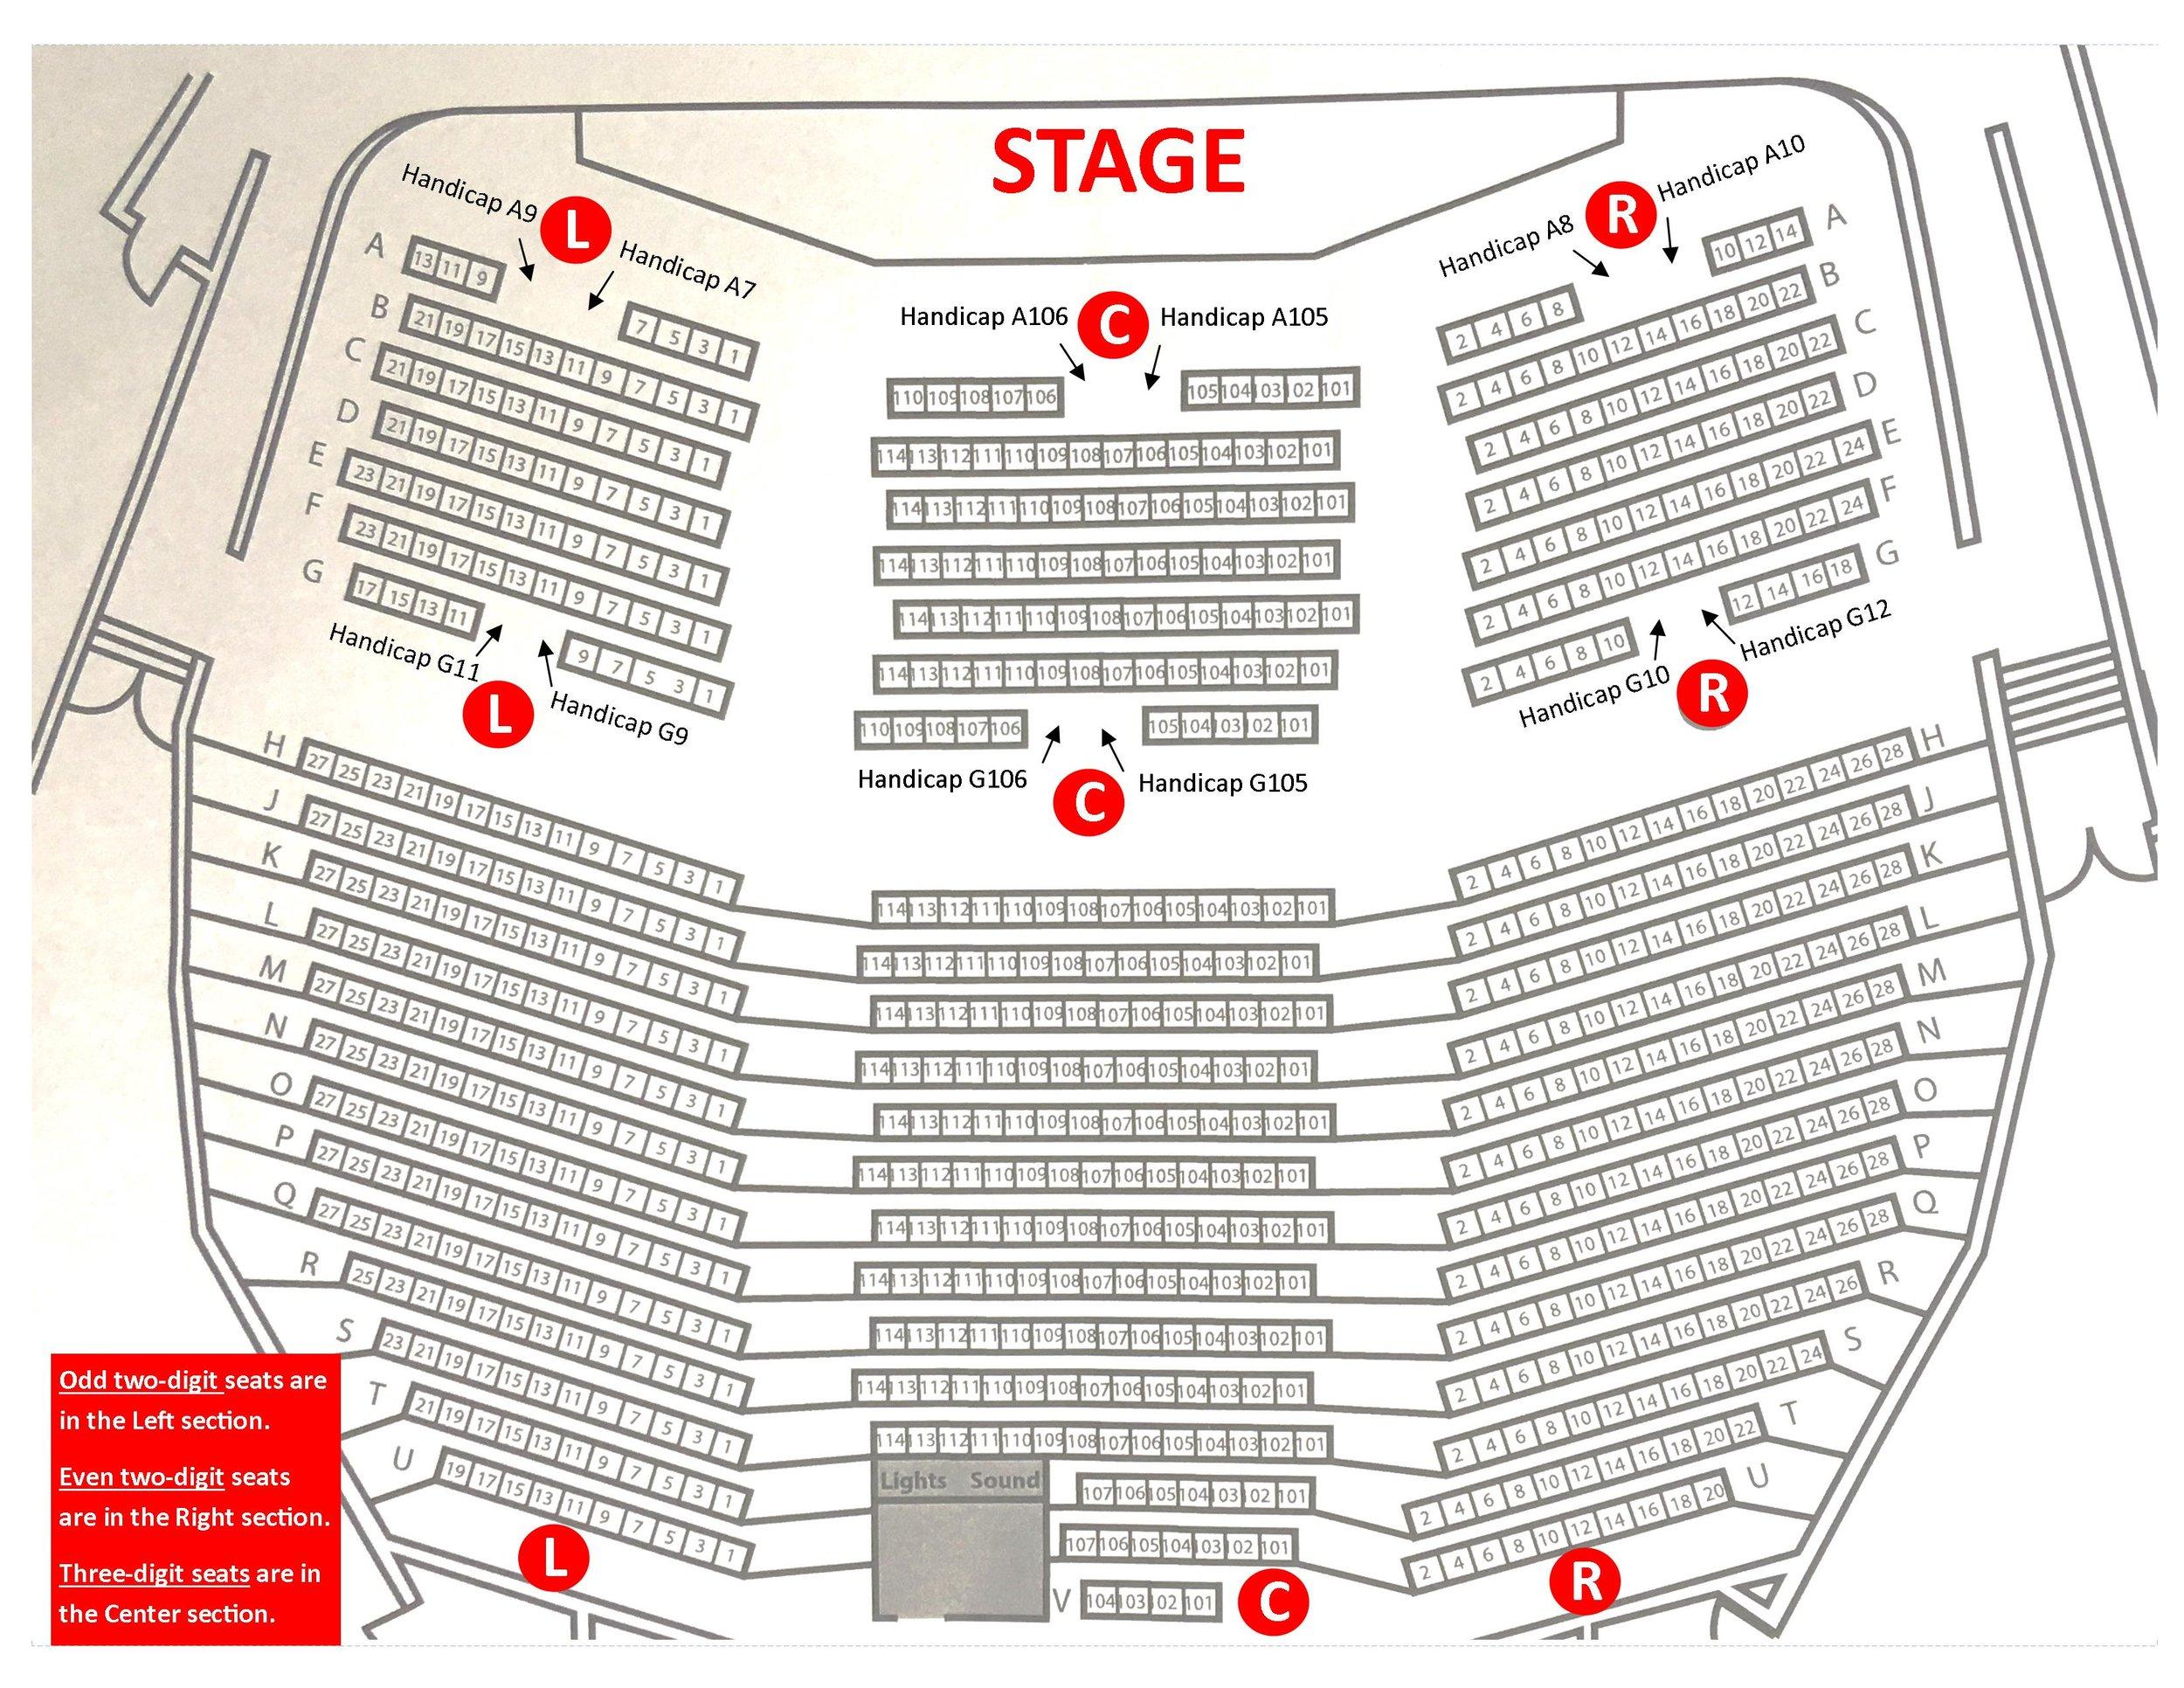 seating chart ushers.jpg